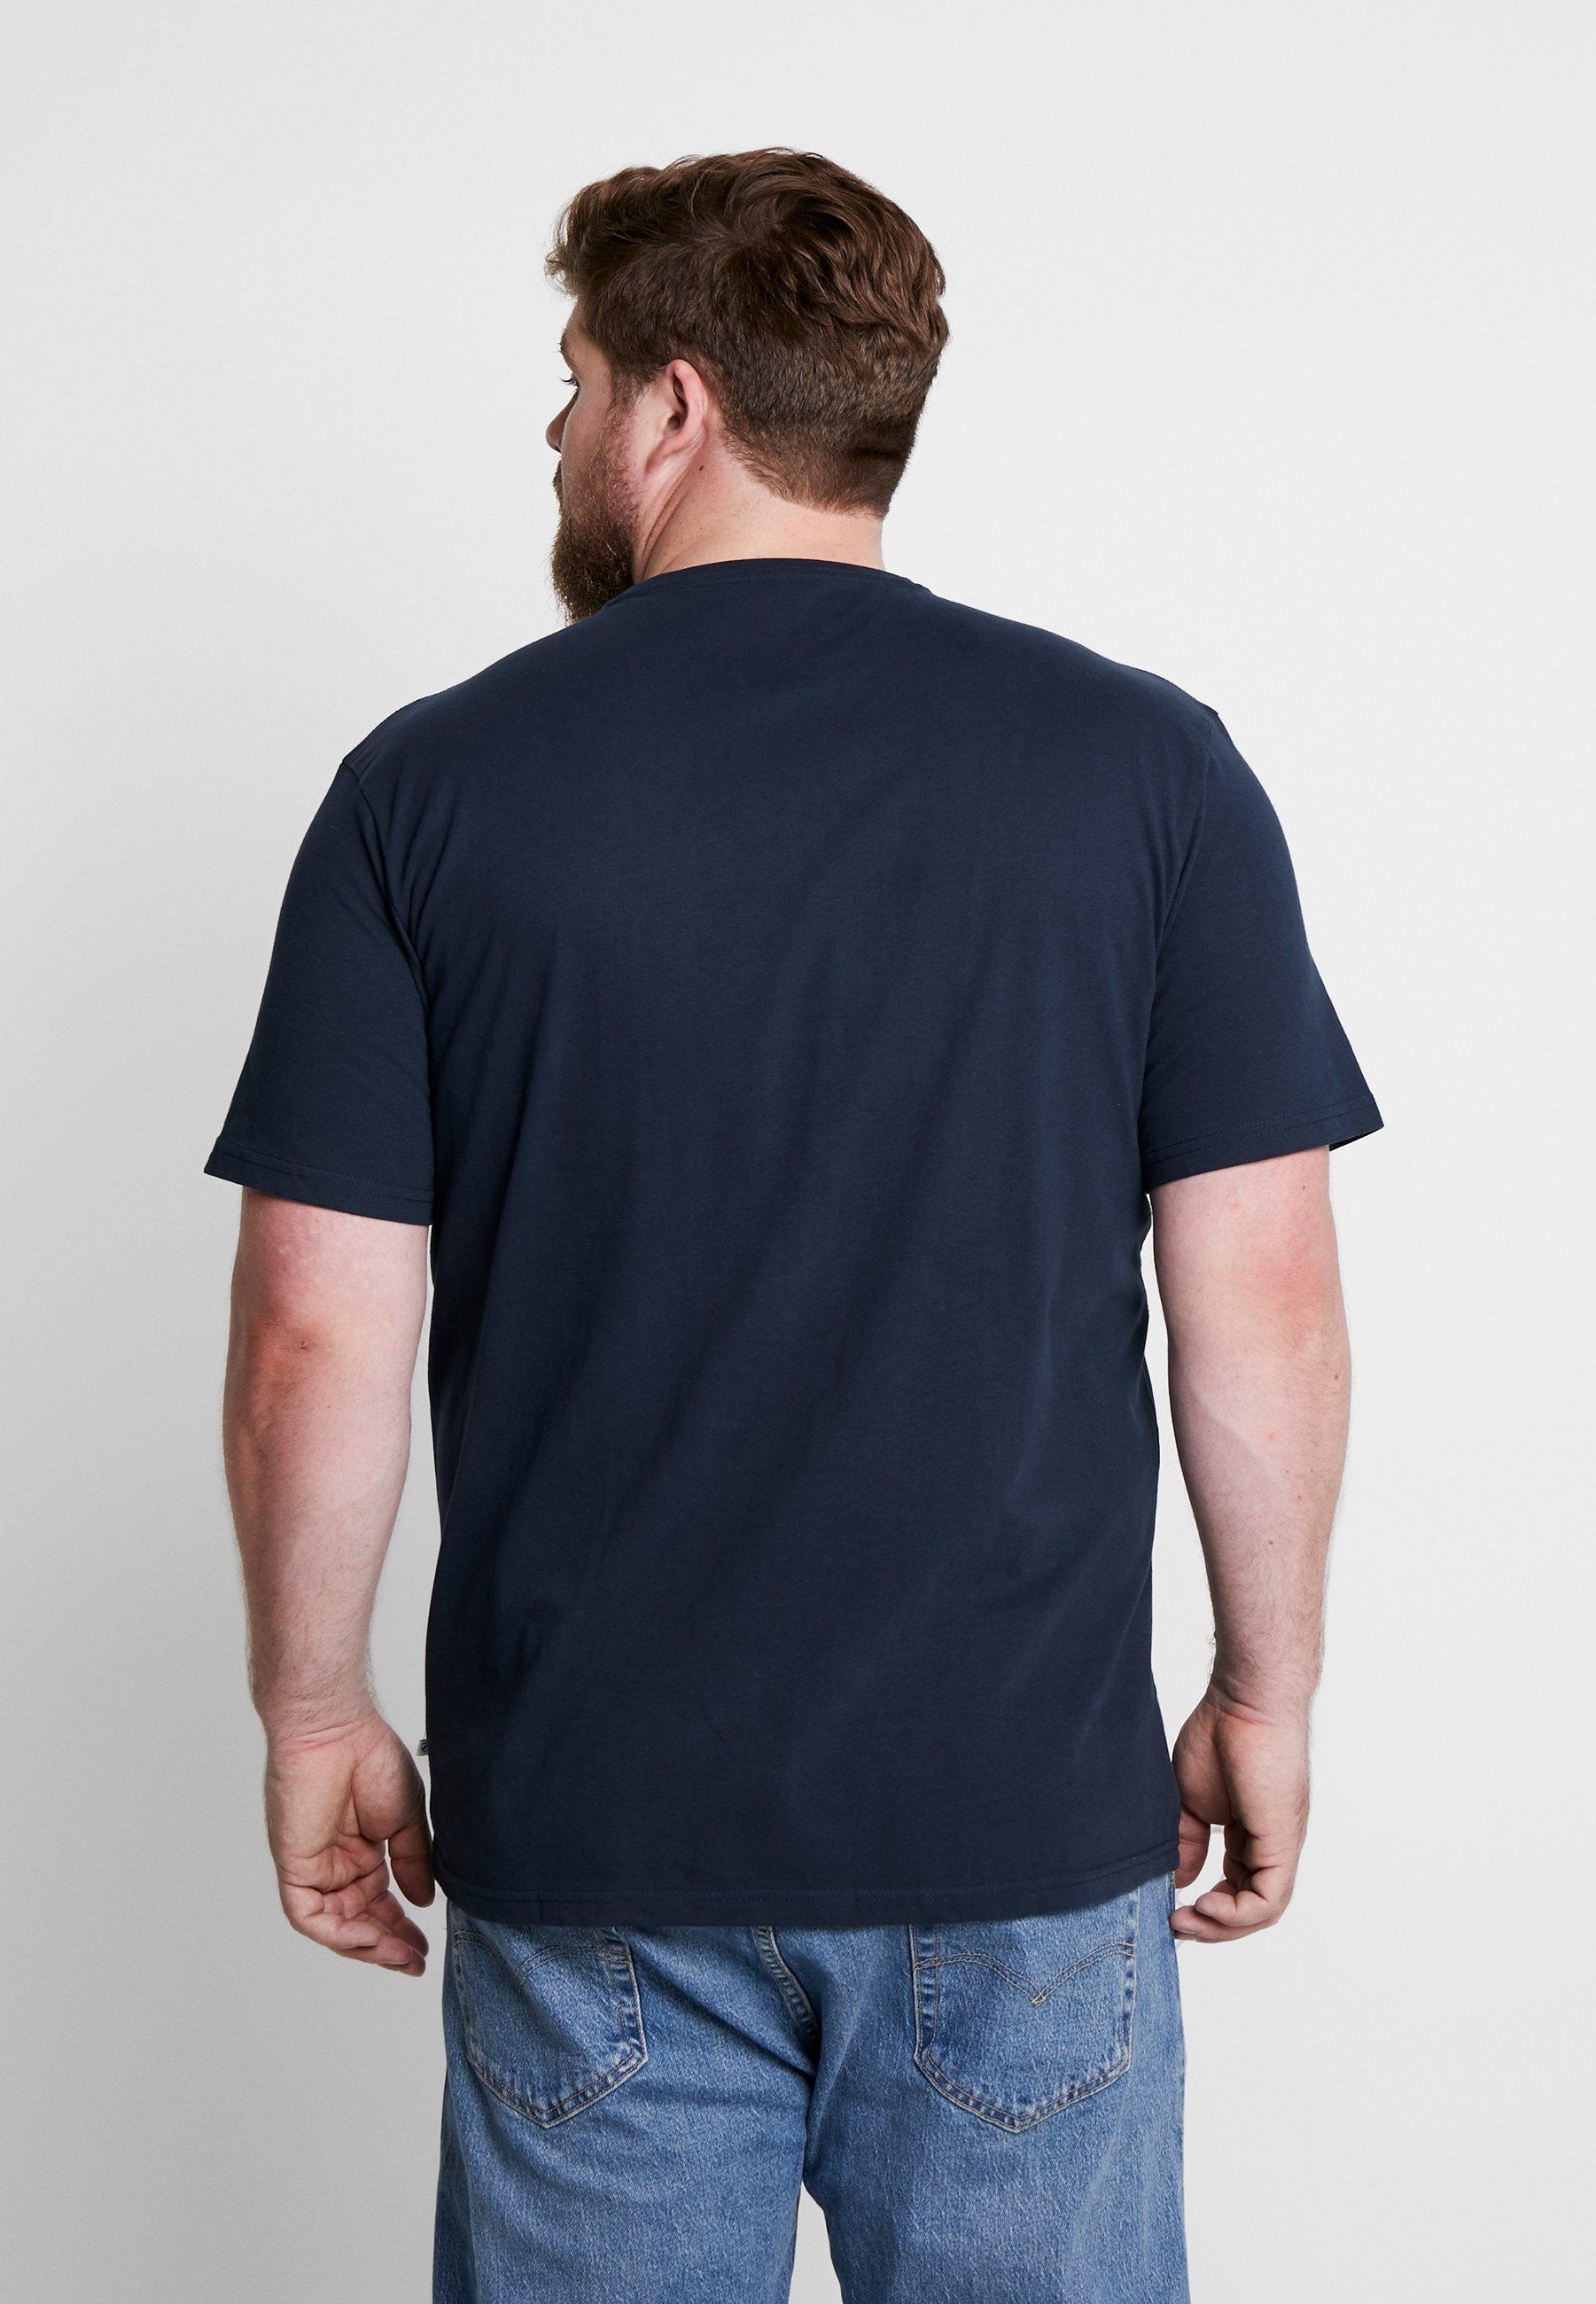 shirt Imprimé Original Sportswear Navy Jack´s NeckT O XZPkOui